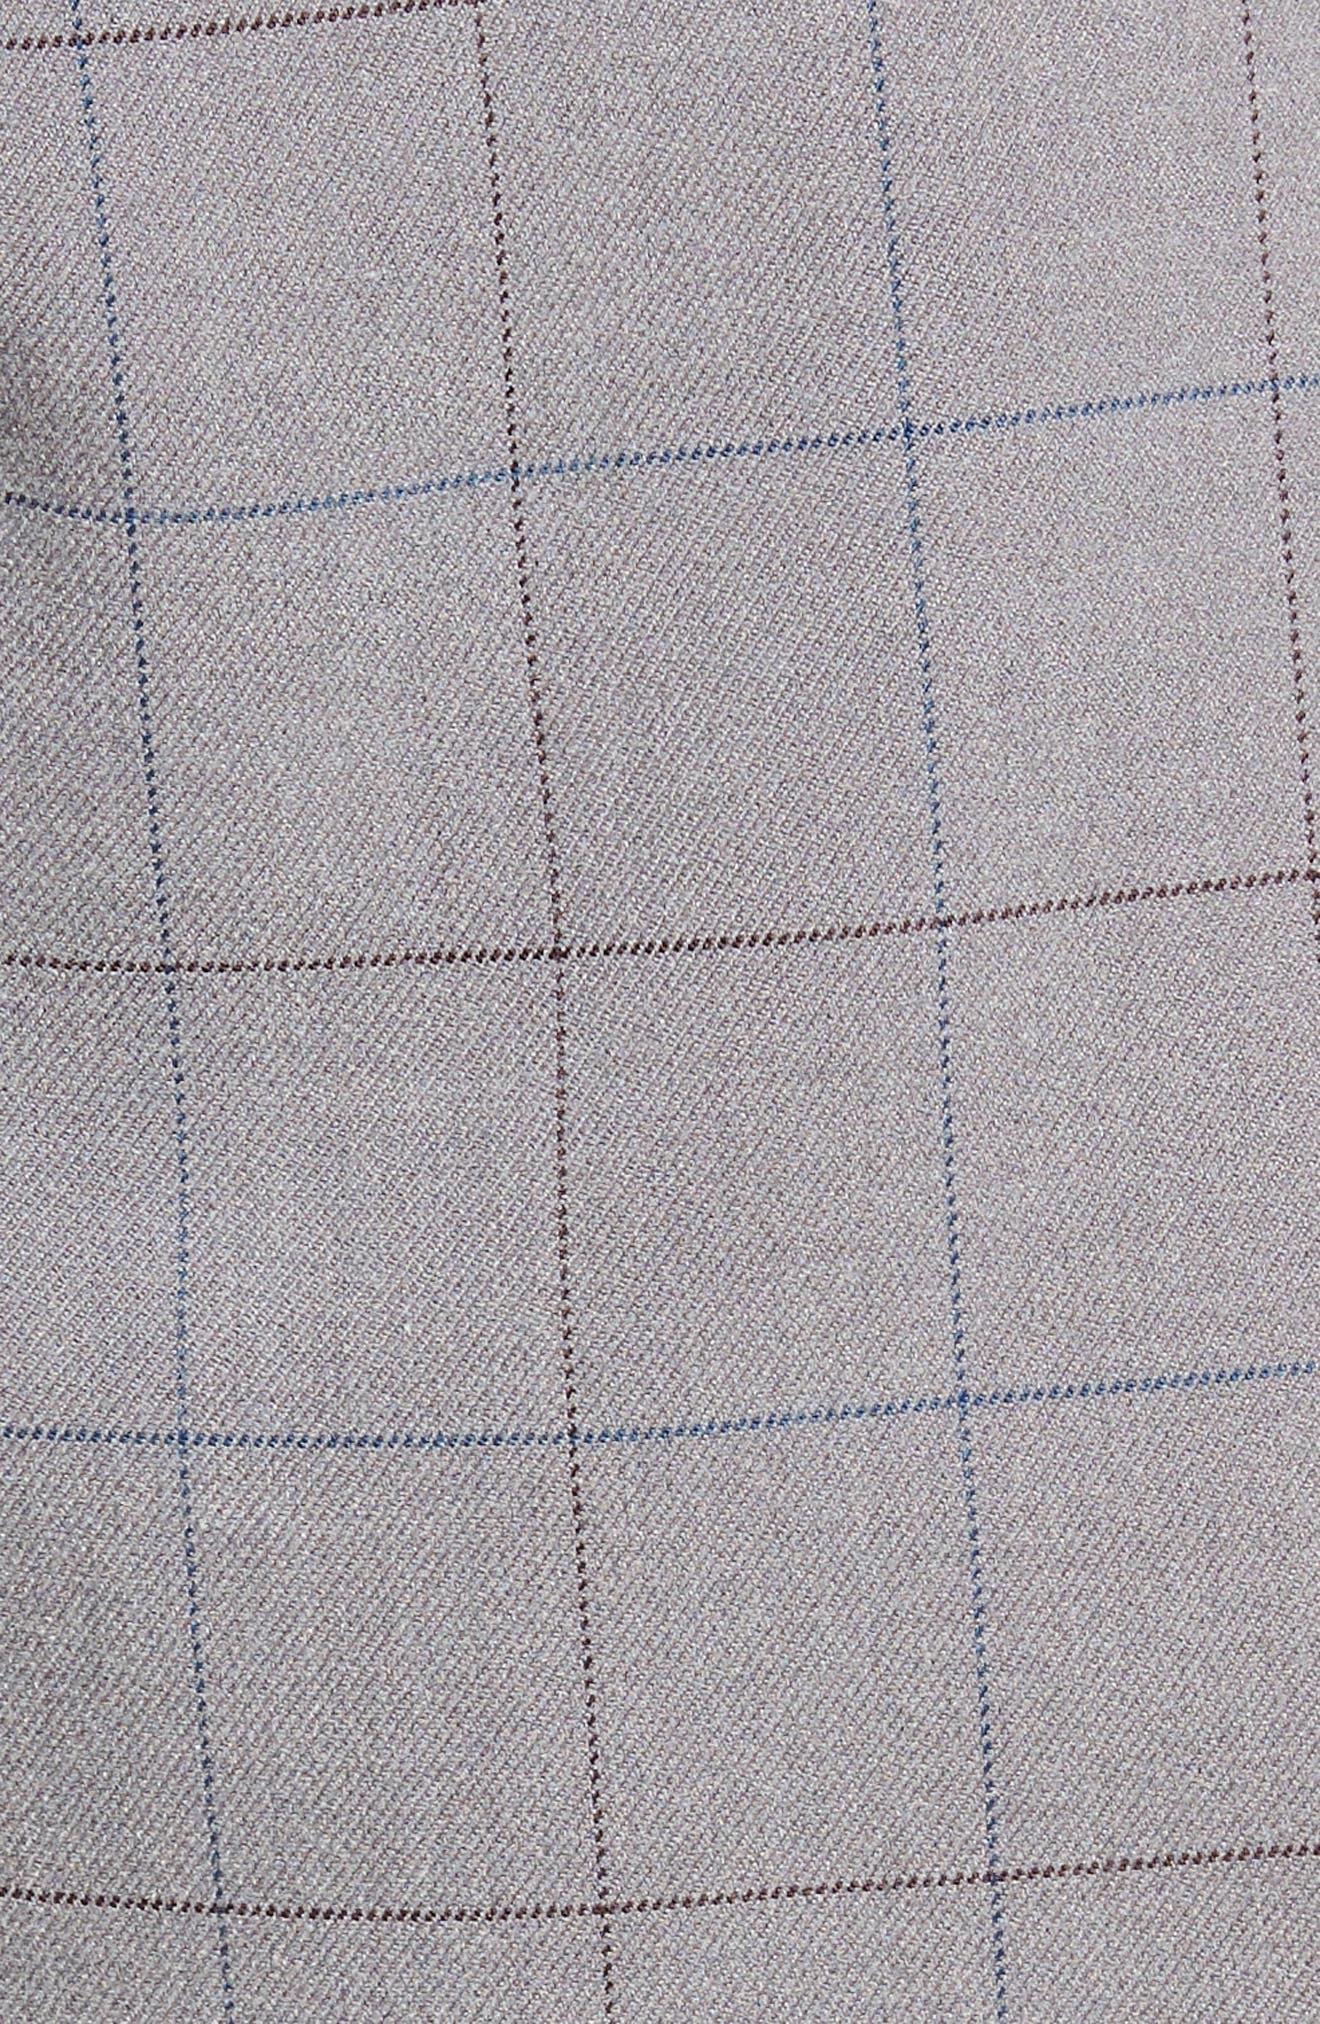 Rickles Regular Fit Shorts,                             Alternate thumbnail 5, color,                             020